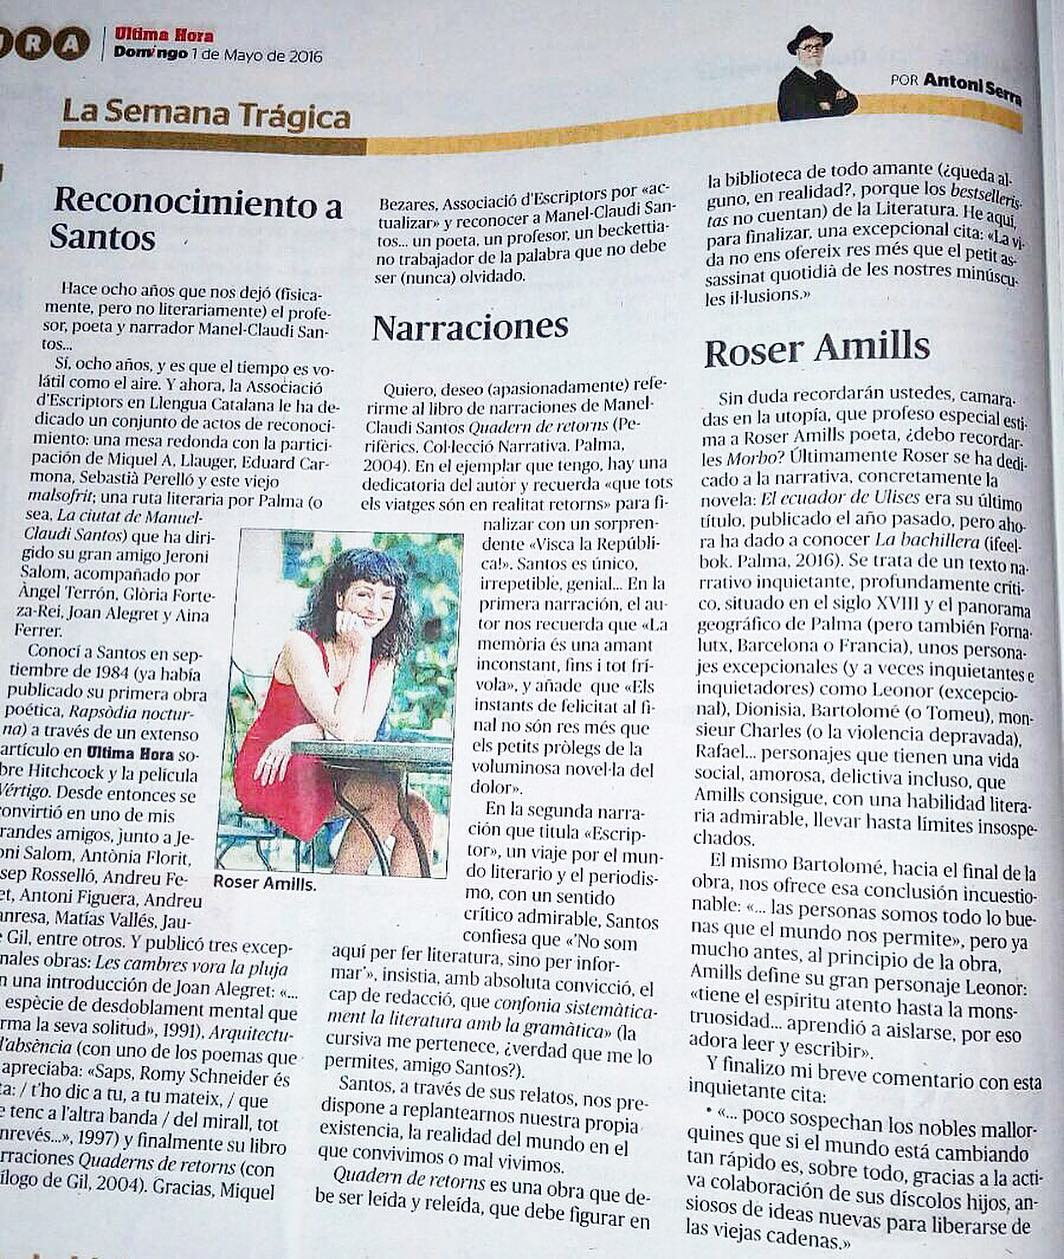 Aquí tenéis lo que dice el gran escritor mallorquín Antoni Serra de mi novela #Labachillera